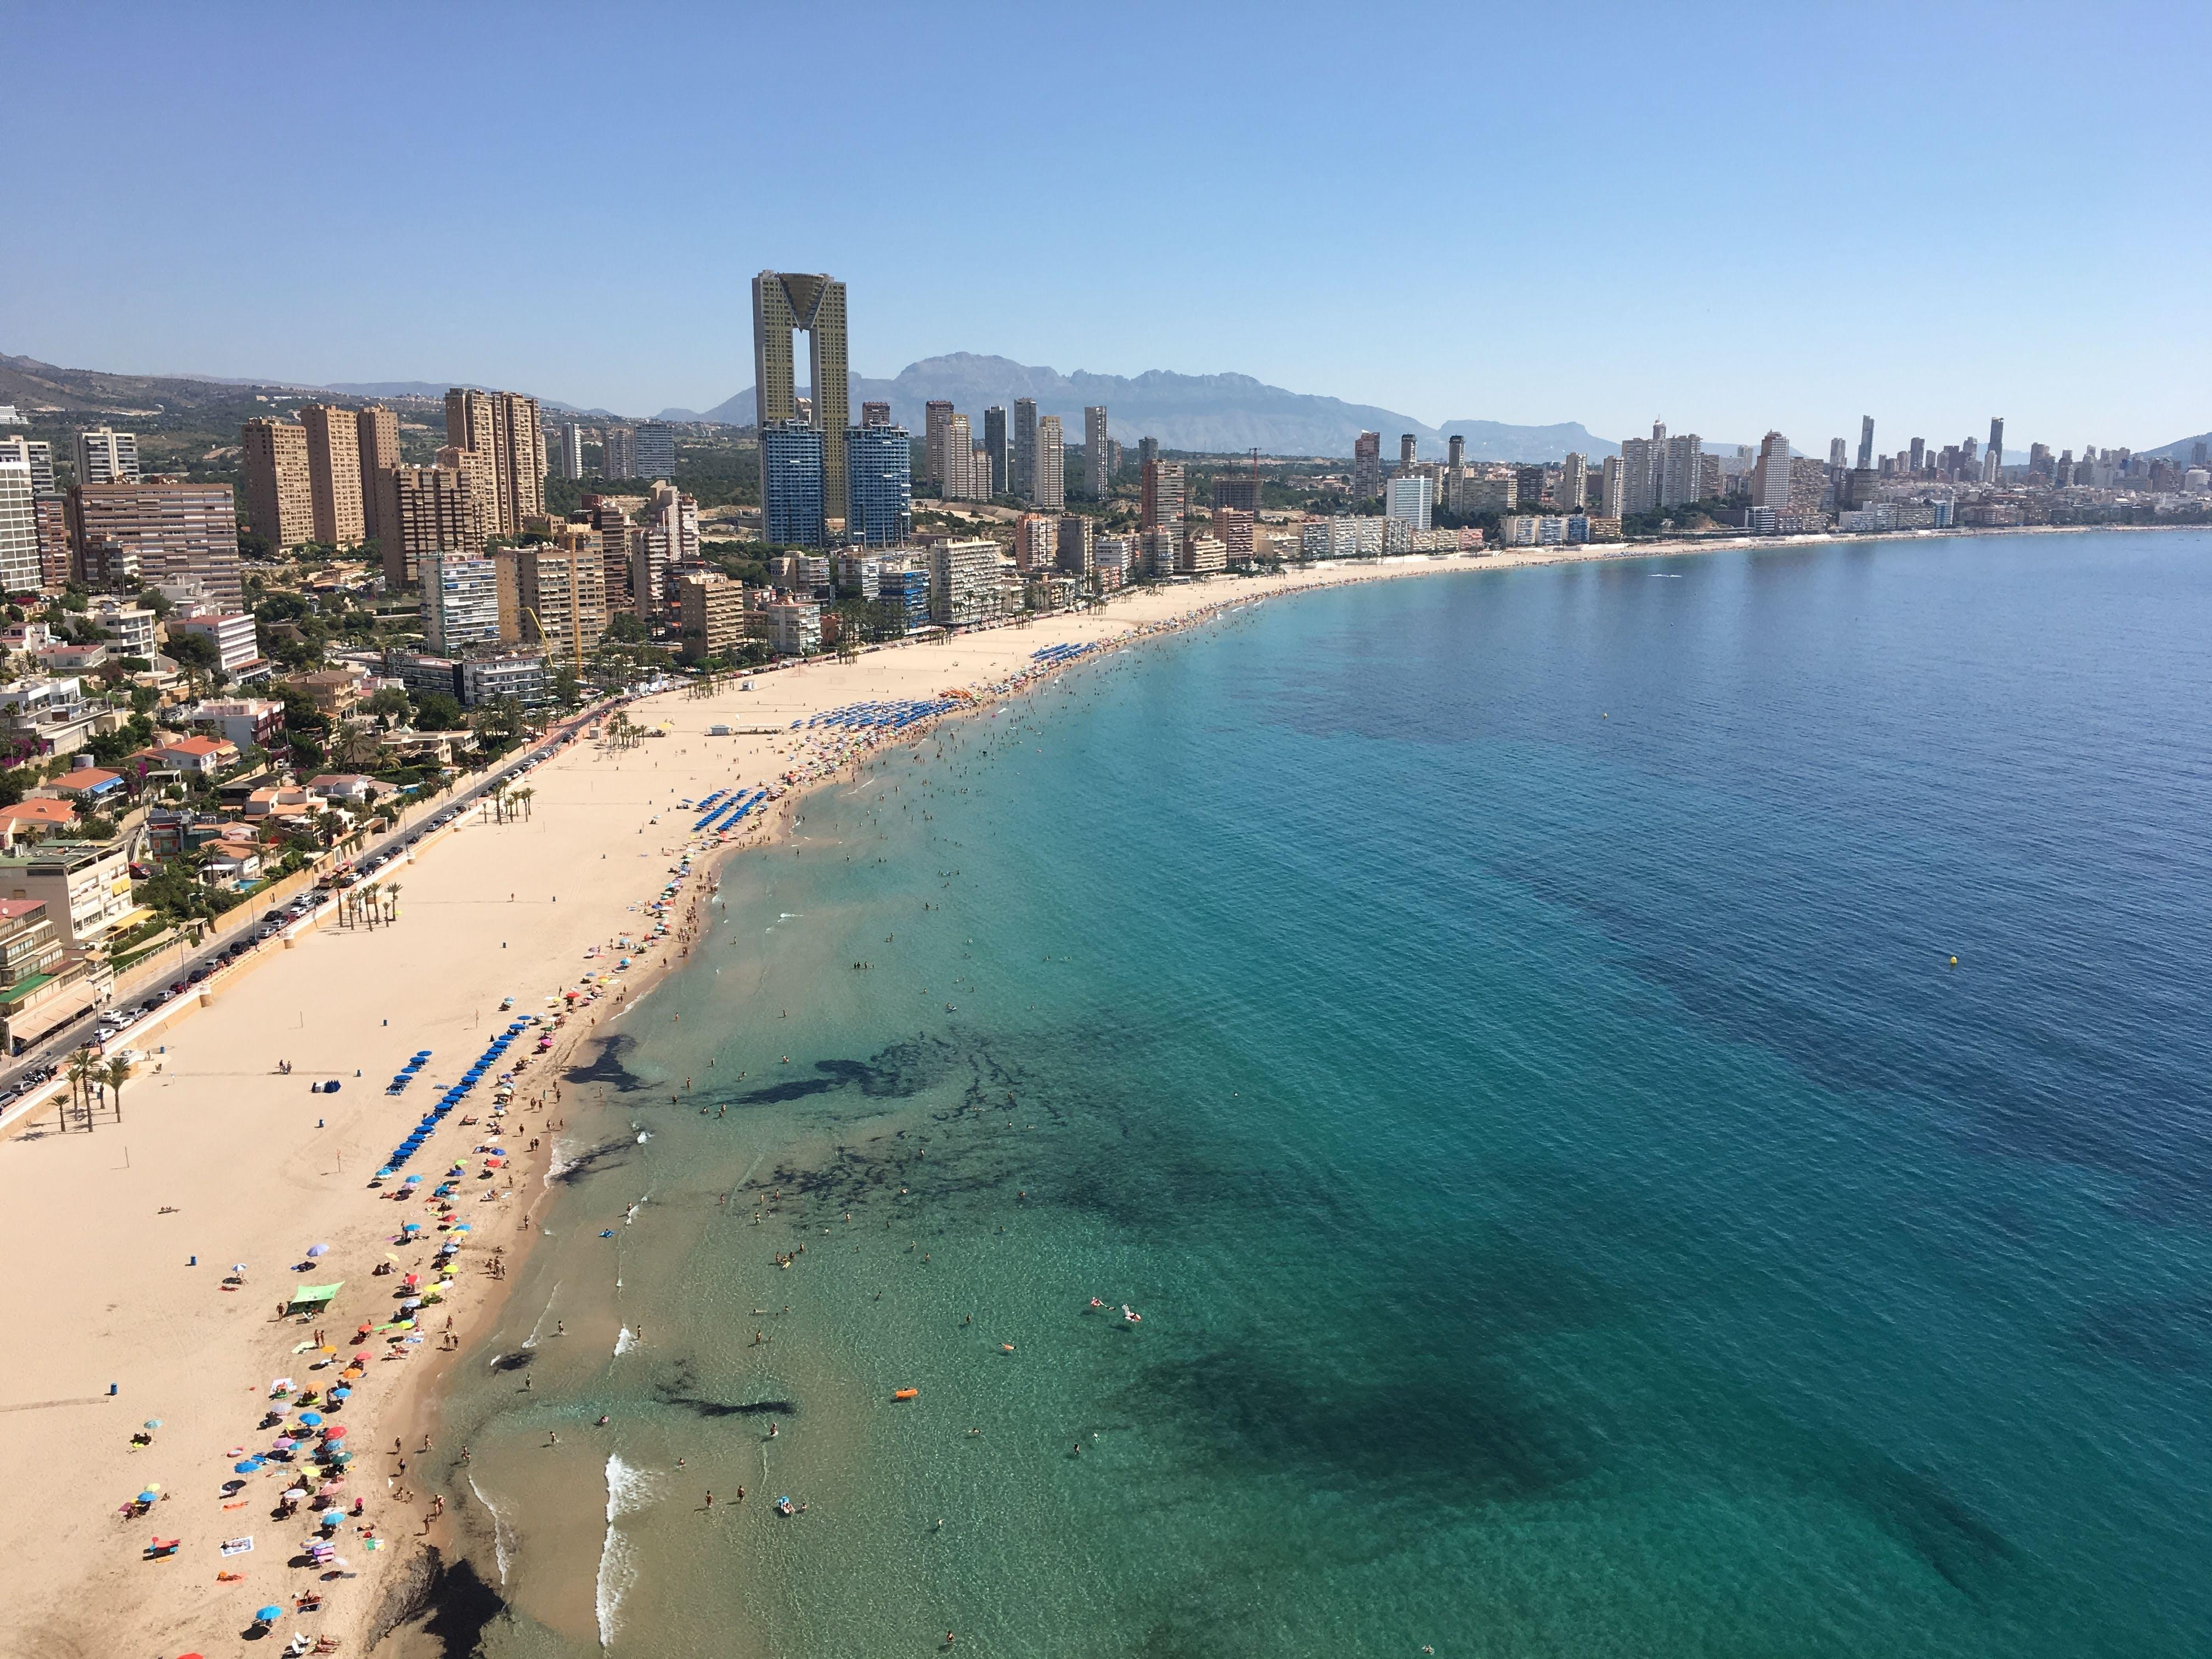 Benidorm, Spain, where UK expats speak Spanish in low numbers